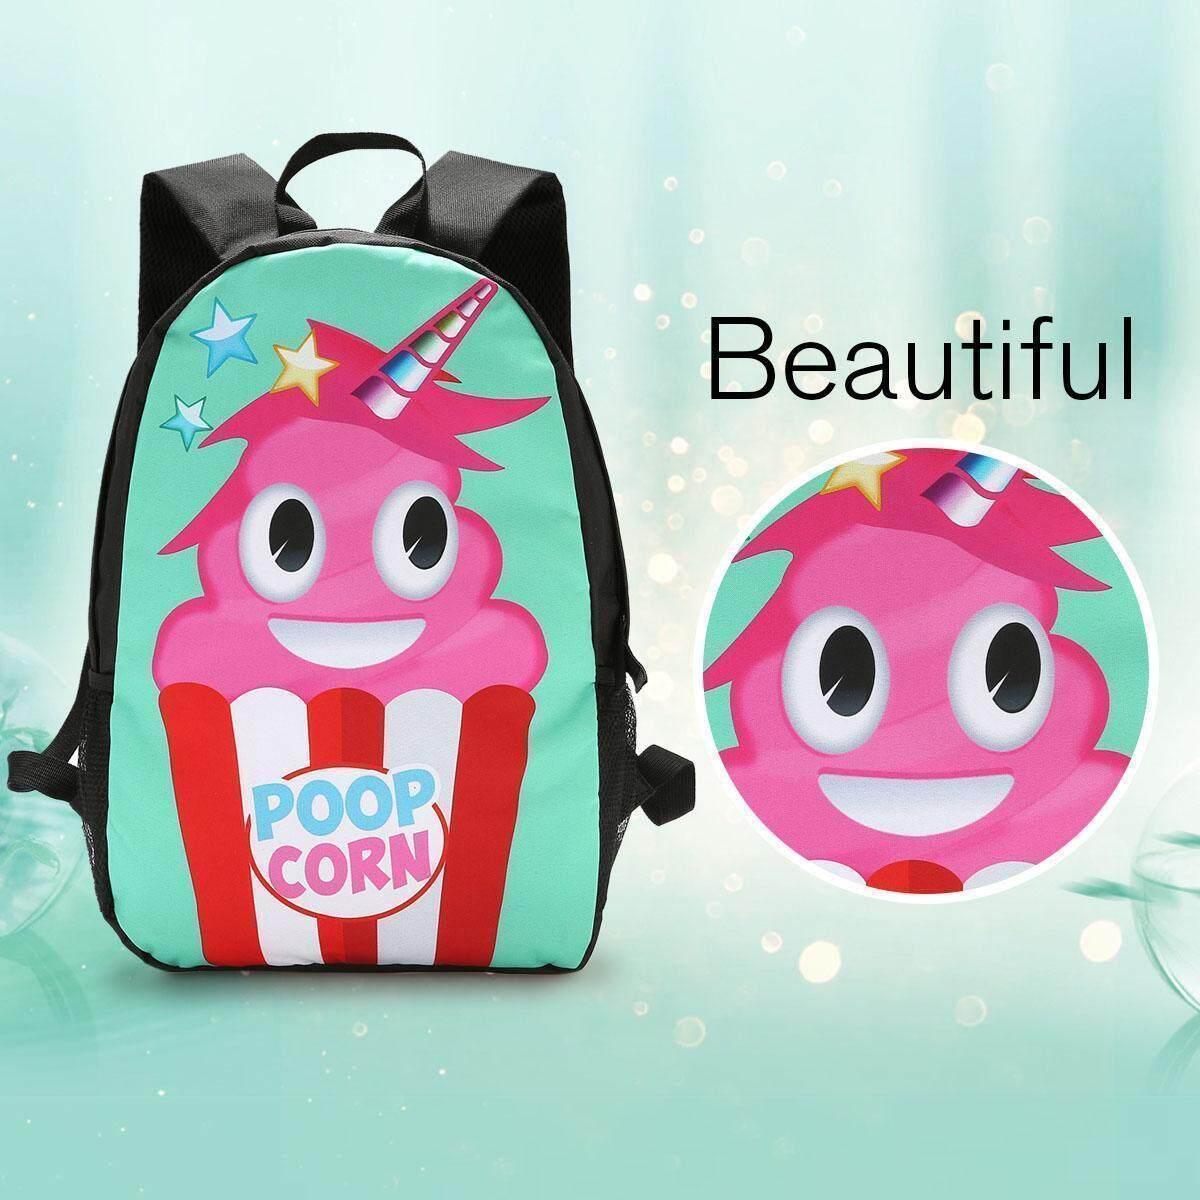 a98ff85febd8 Cute Girls Emoji Unicorn Backpack School Bags Laptop Rucksack Tote Shoulder  Bag